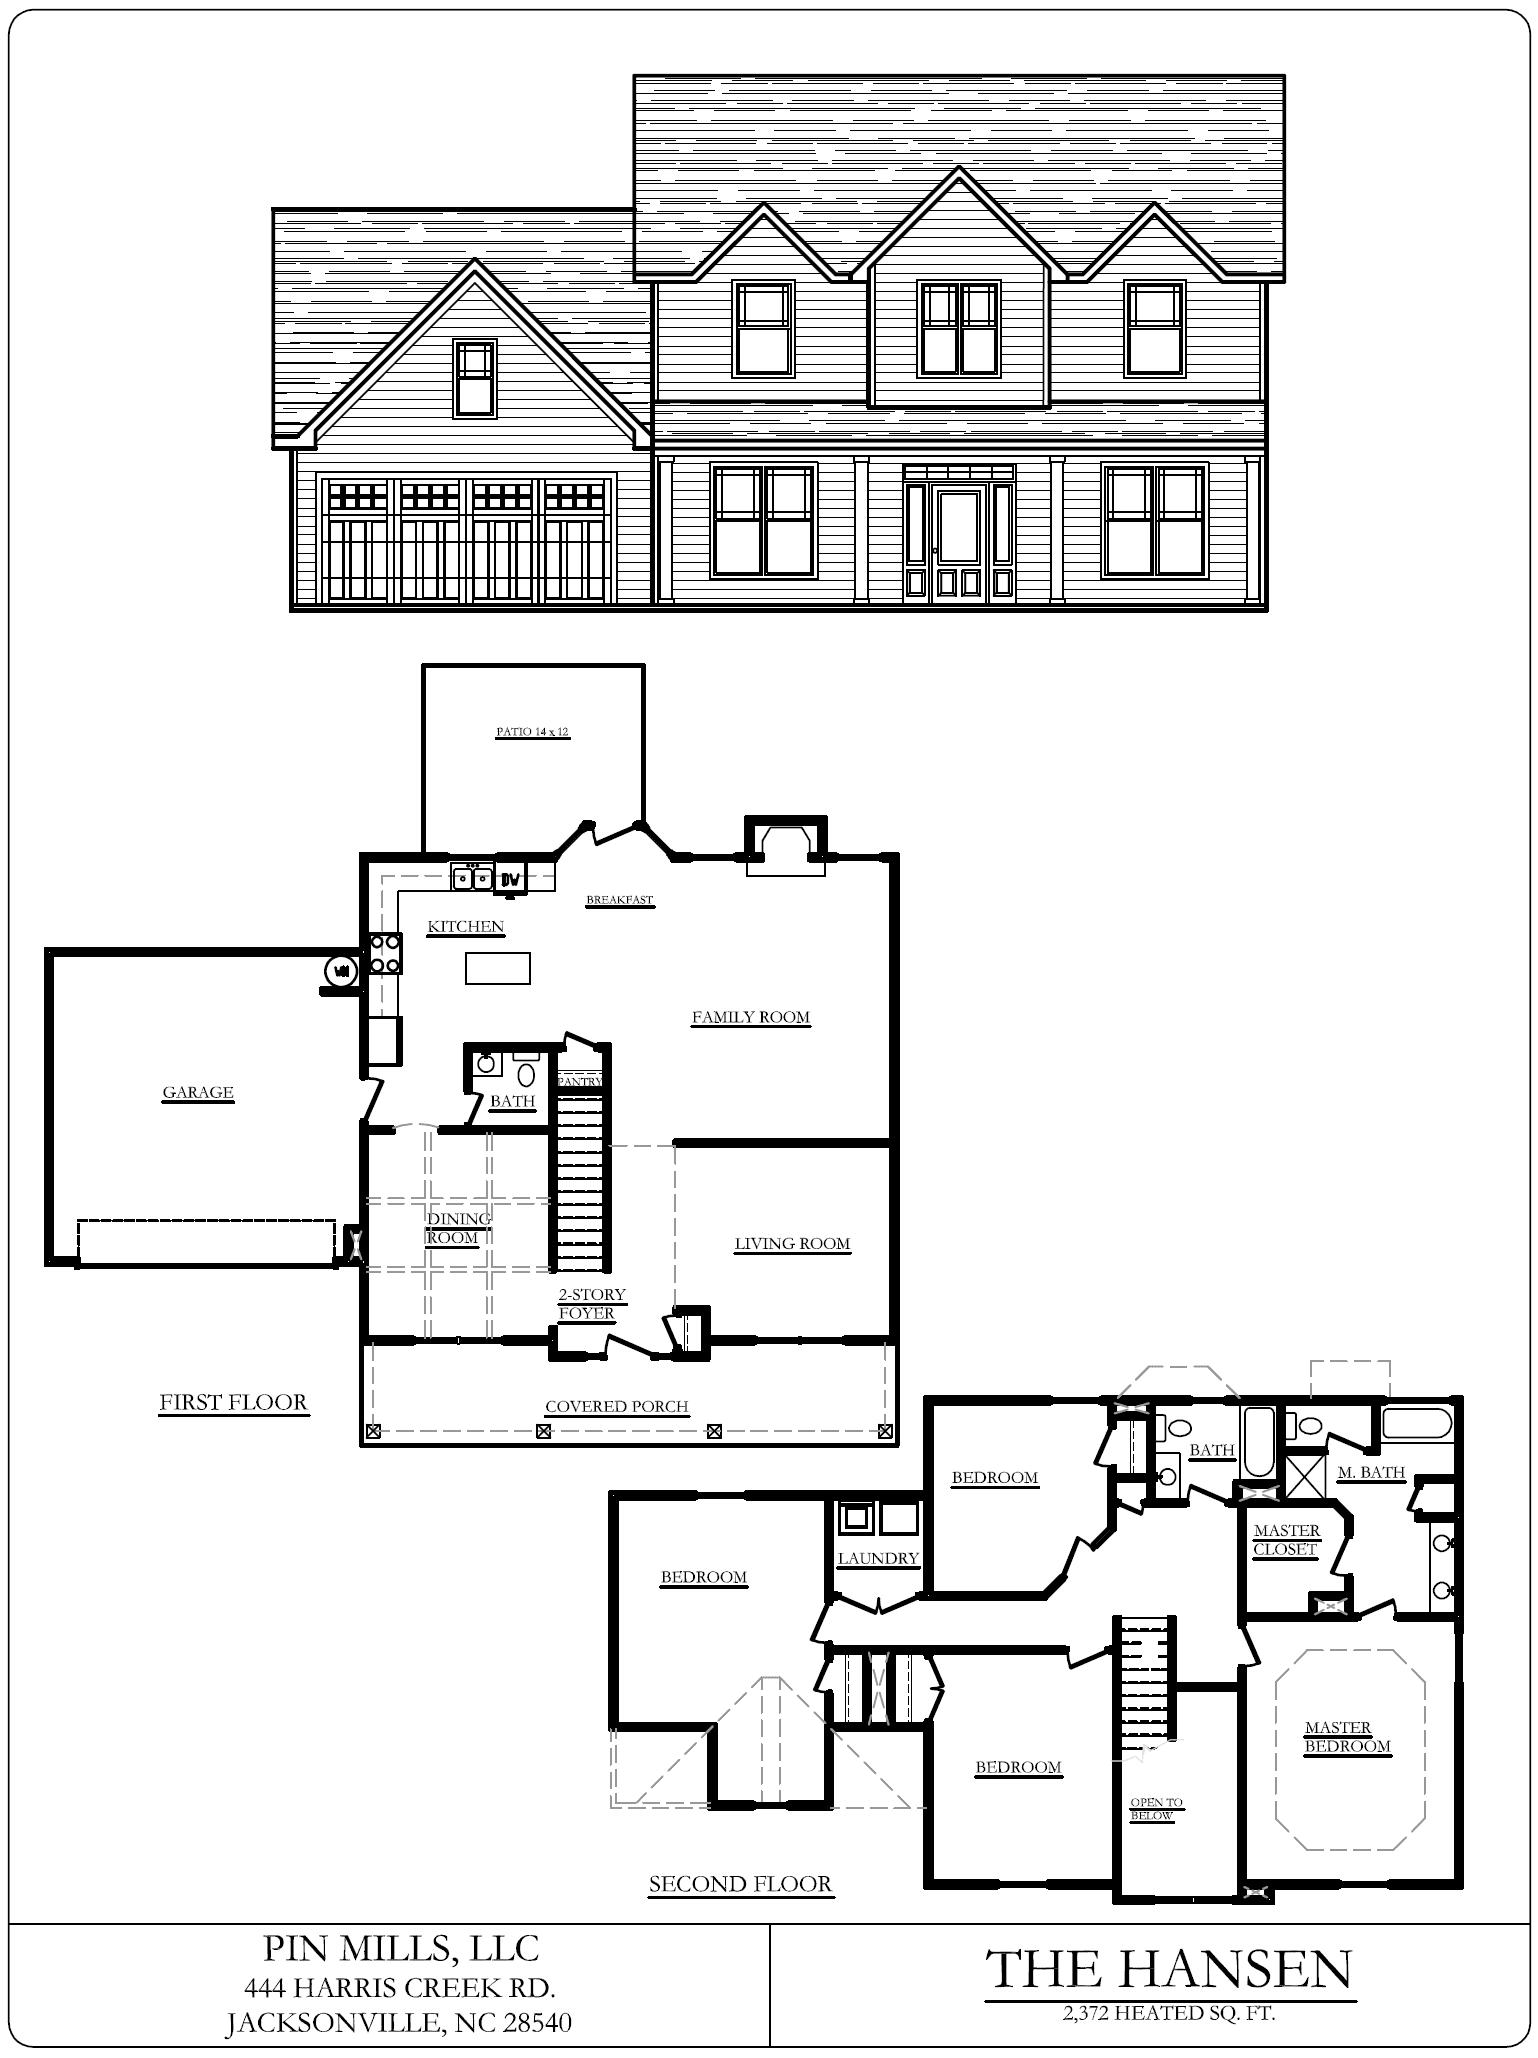 flooplan blueprints for the Southwest Plantation Hansen home